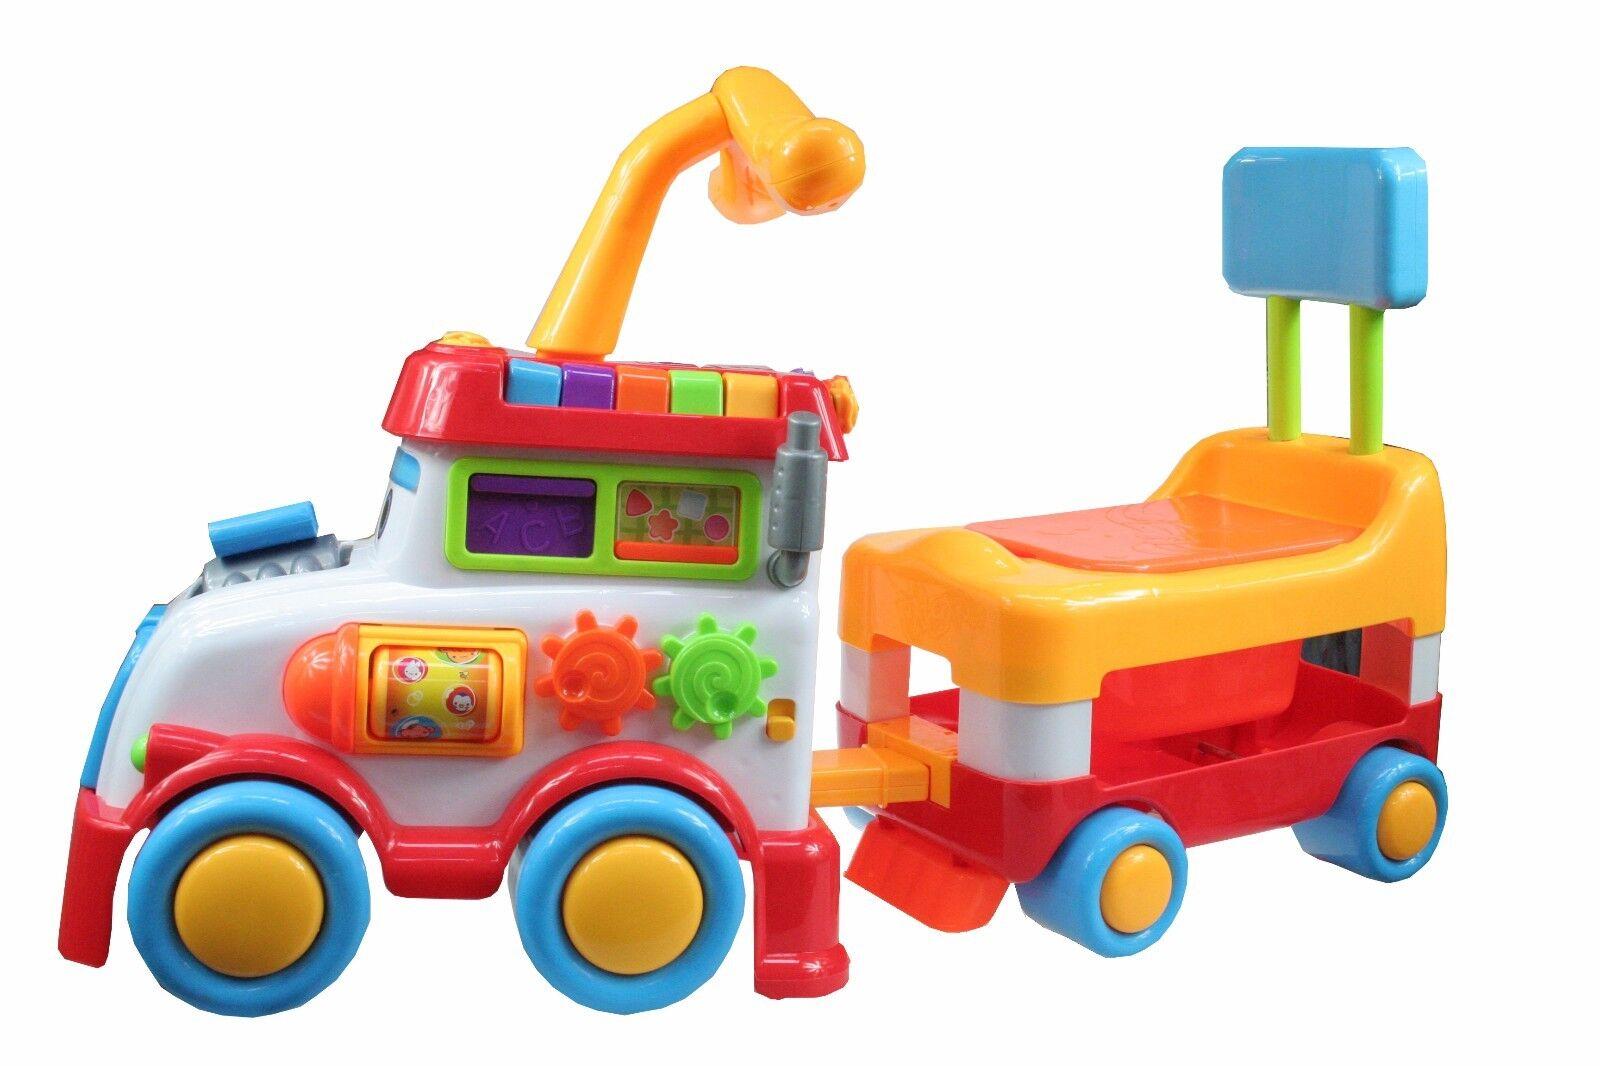 Interaktive Rutschauto Lokomotive Rutscher  Kinderfahrzeug Spielzeug Spielzeug Spielzeug 735f00